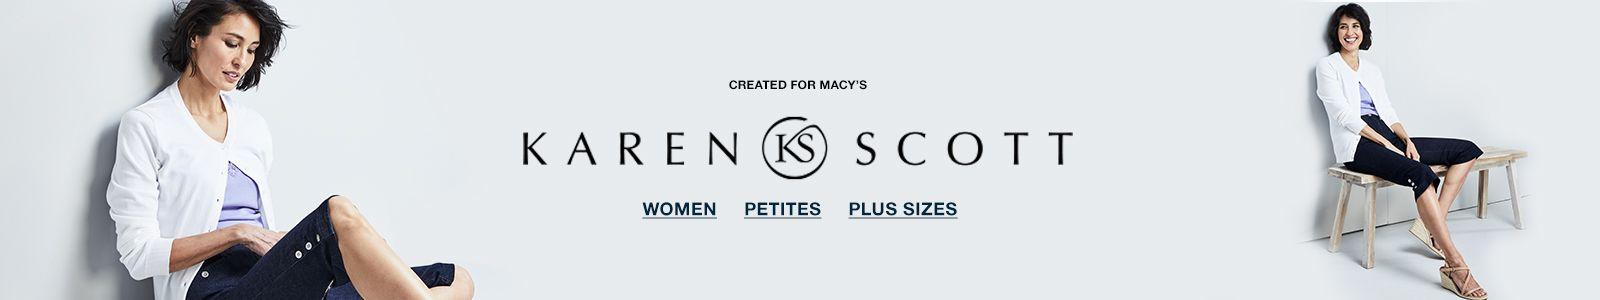 Created For Macy's, Karen Scott, Women Petites, Plus Sizes